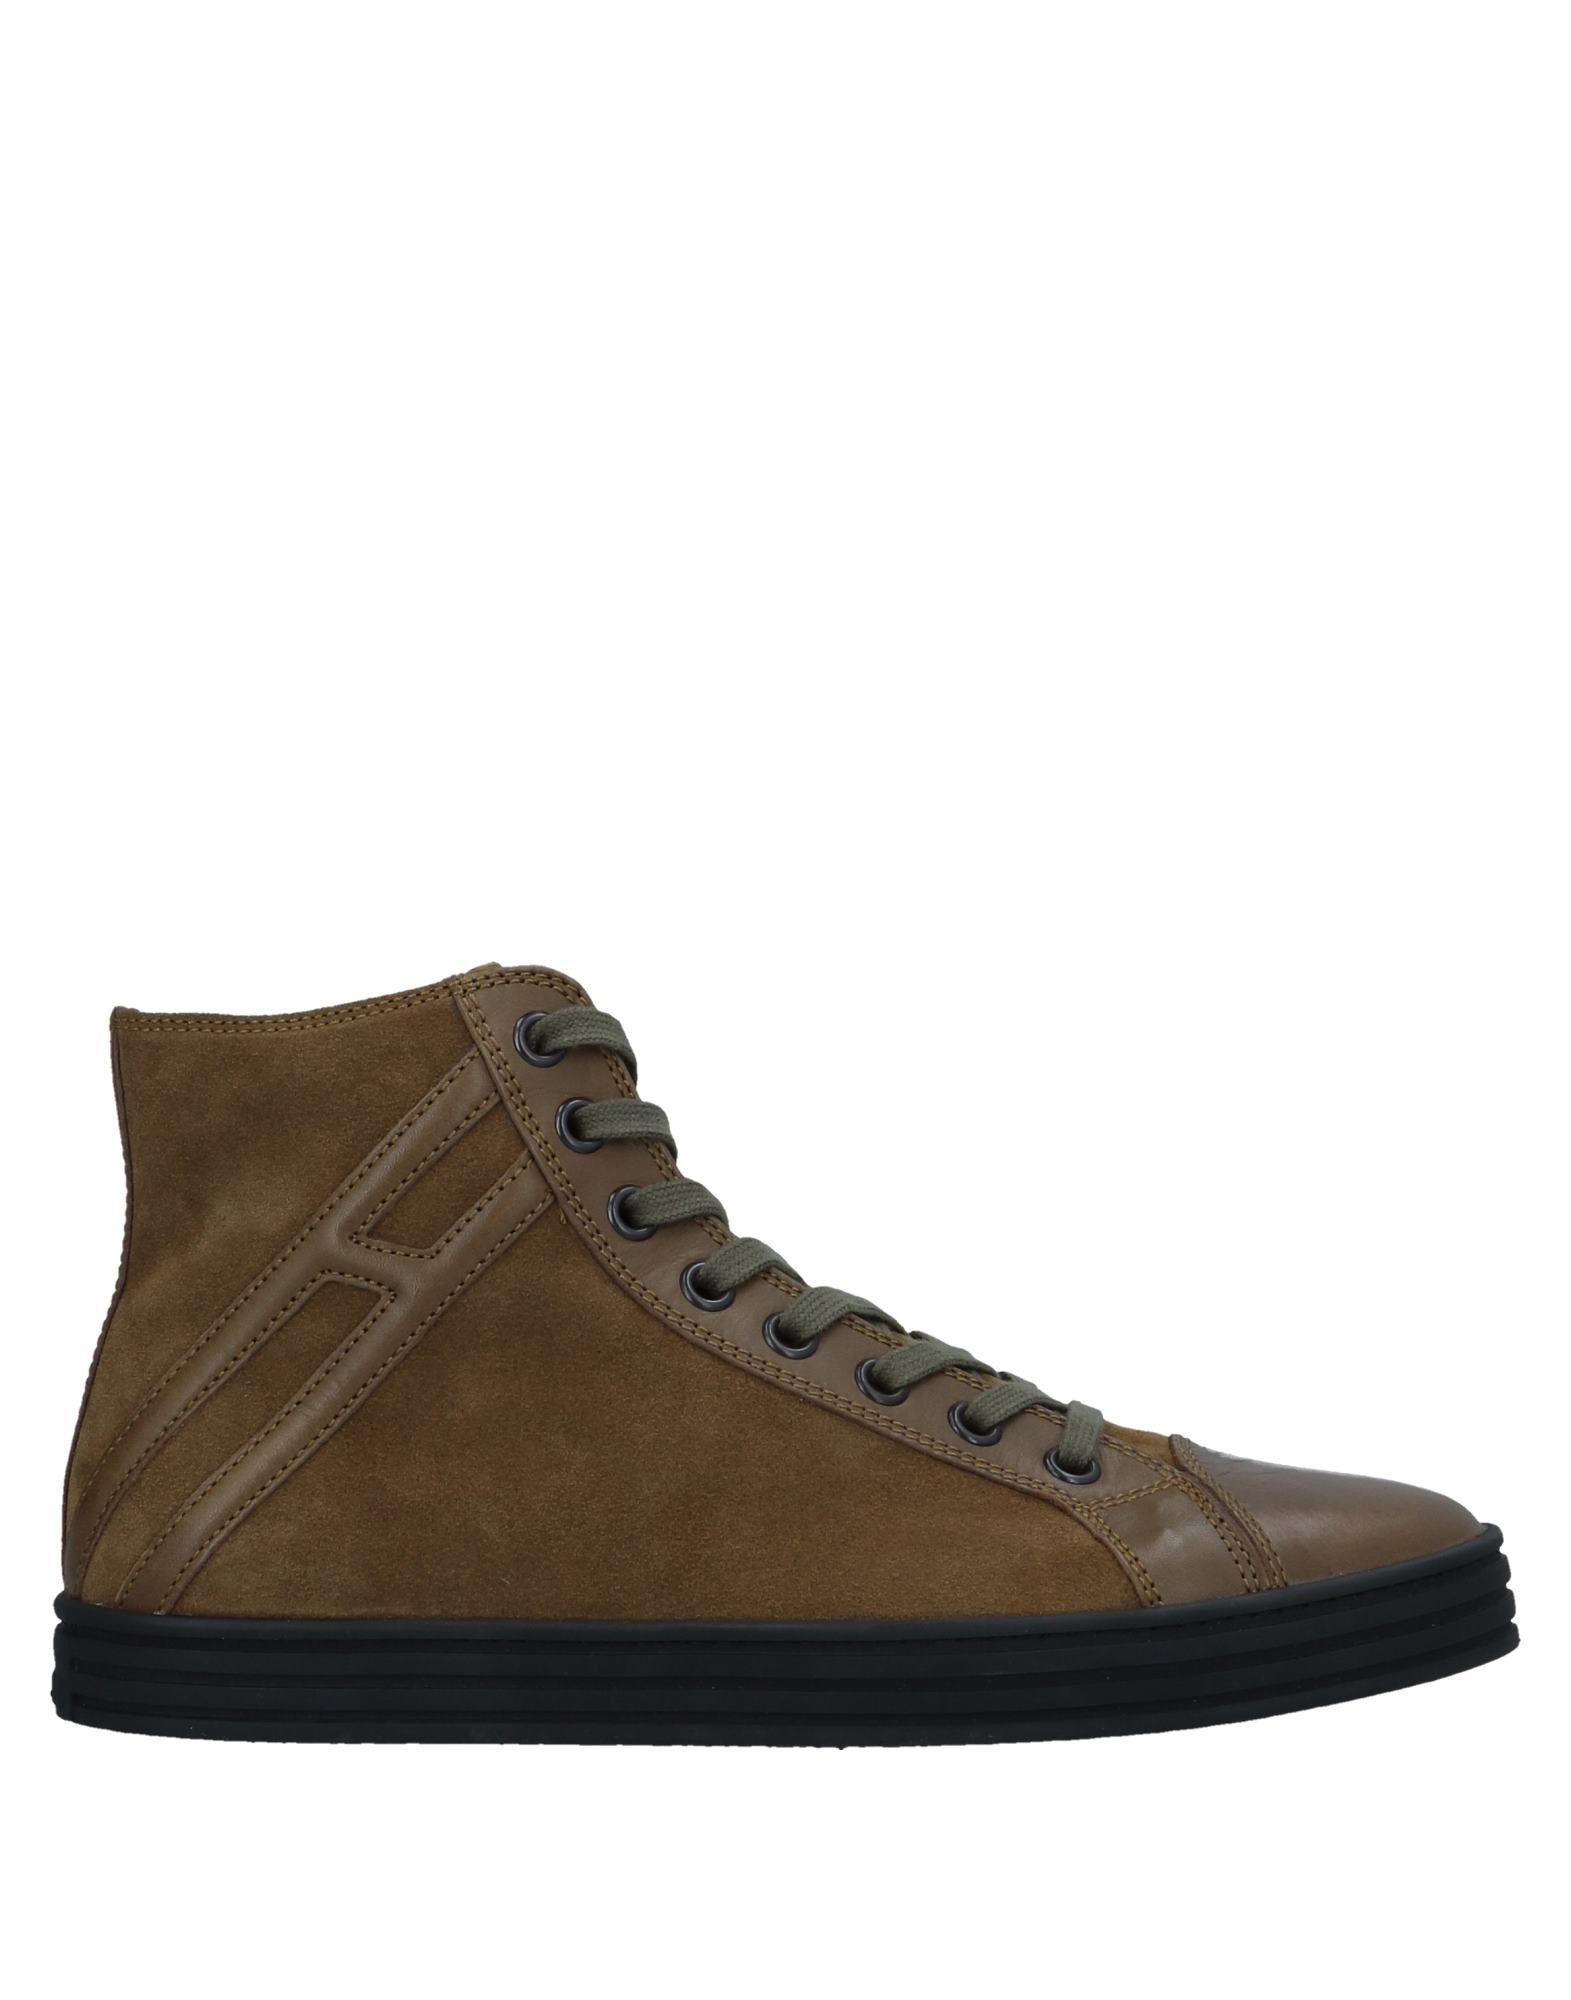 Sneakers Hogan Rebel Uomo - 11541446GJ 11541446GJ - b059ab